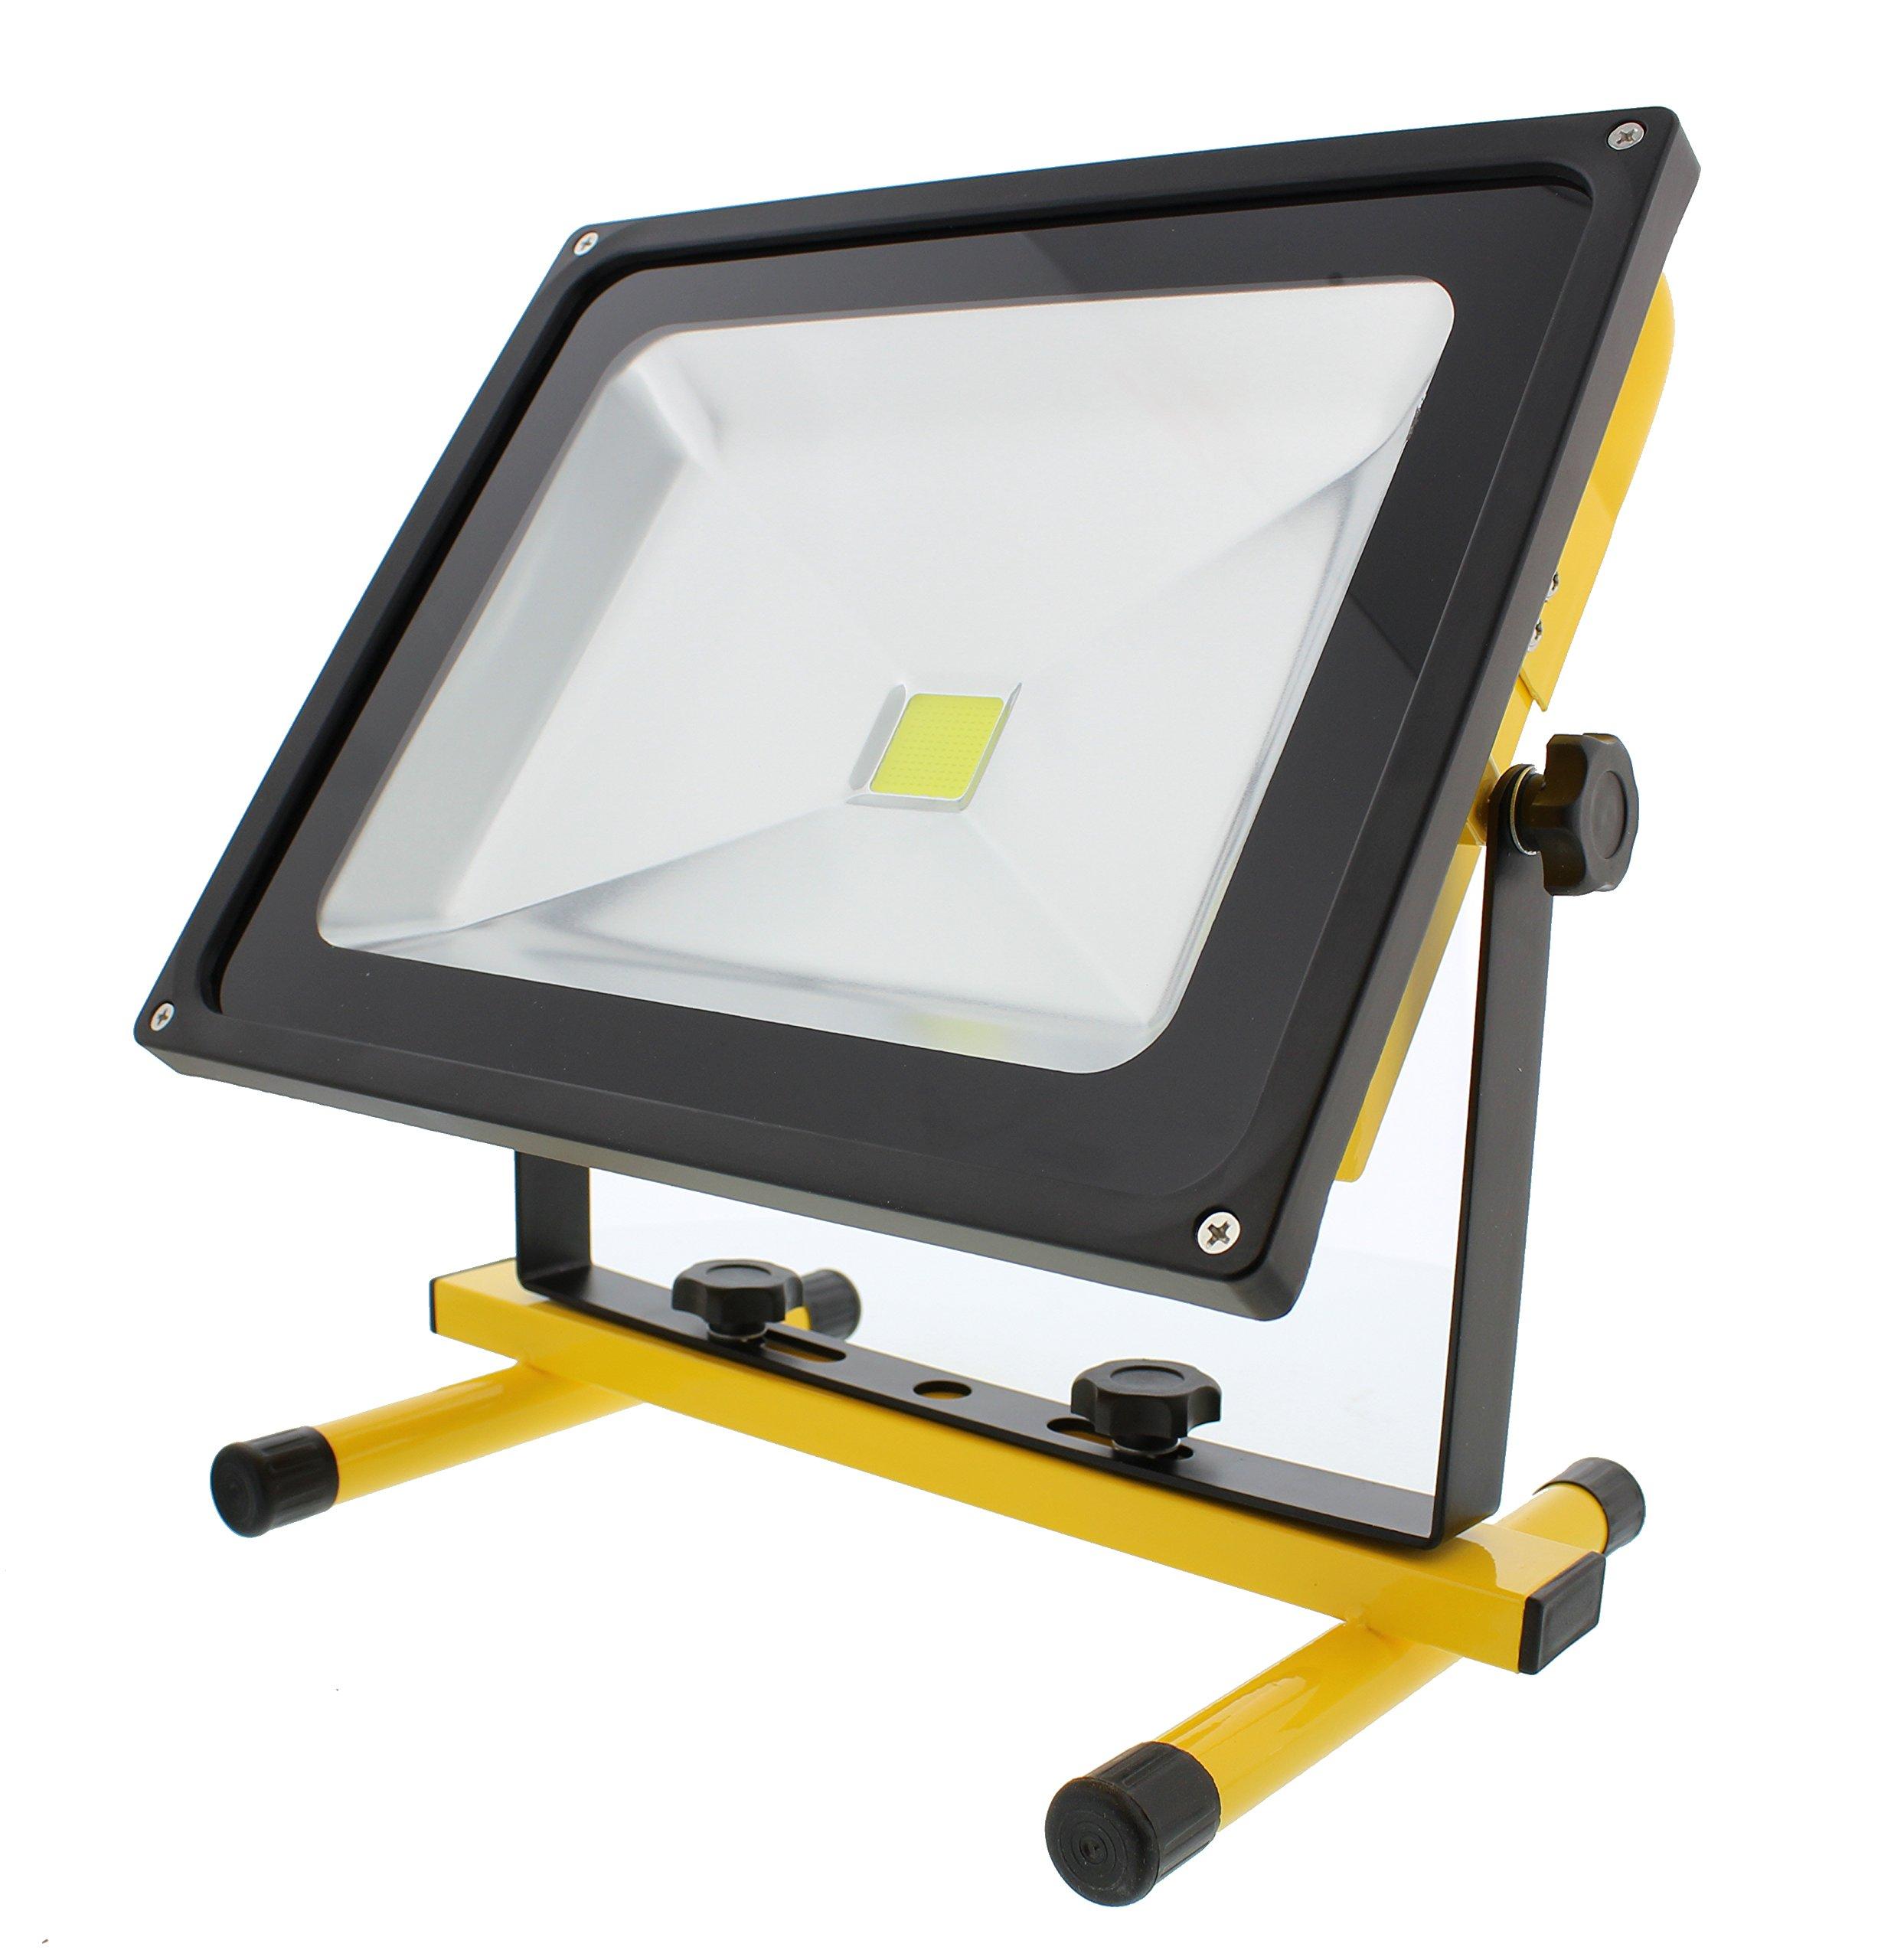 ABN LED Flood Light 50 Watts 4,500 Lumens 12V Indoor/Outdoor IP 65 Waterproof Rechargeable Portable Job Site Work Light